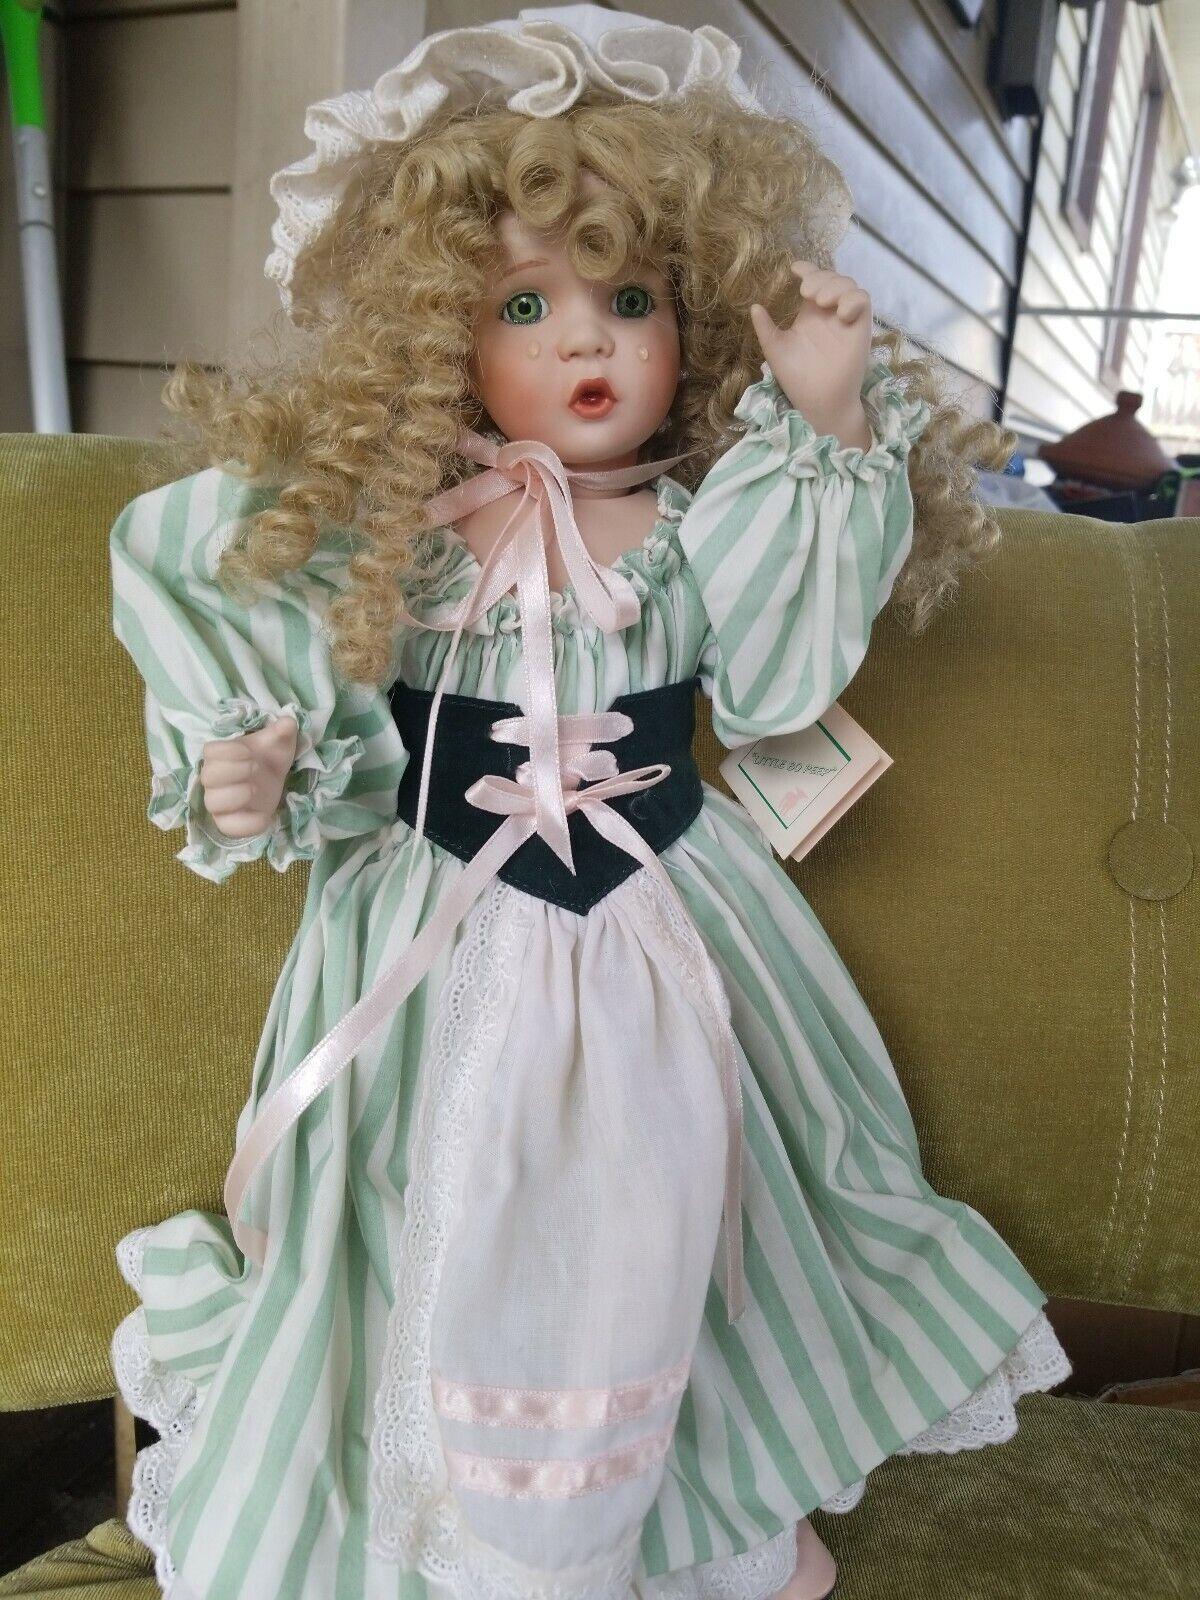 Senza tasse Wendy Lawton Porcelain bambola bambola bambola 16  Blonde Curl hair verde Eyes Crying Tears w ste  l'ultimo